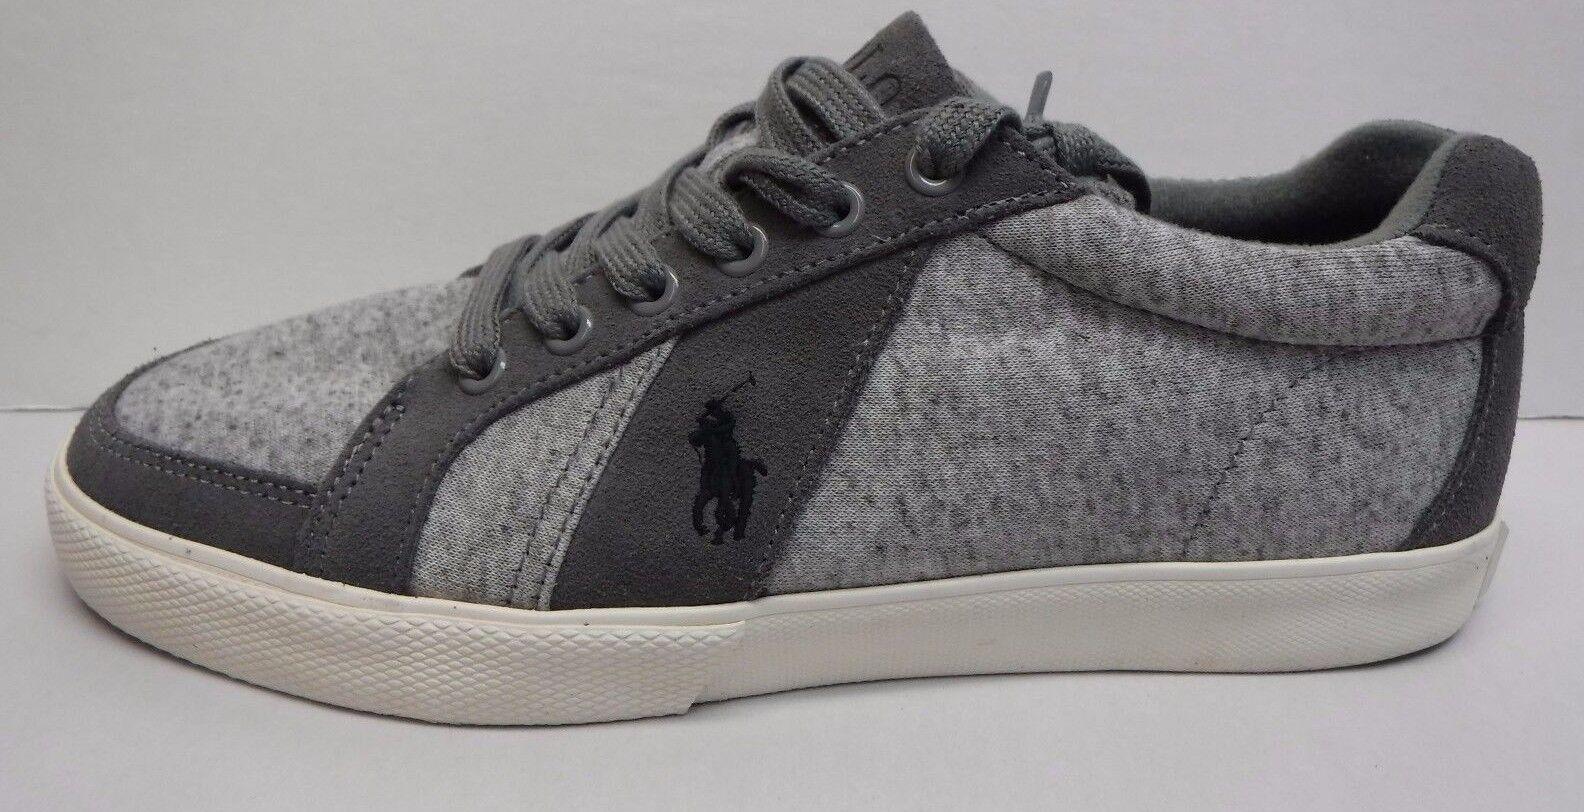 Scarpe casual da uomo Polo Ralph Lauren Size 14 Gray Sneakers New uomos Shoes